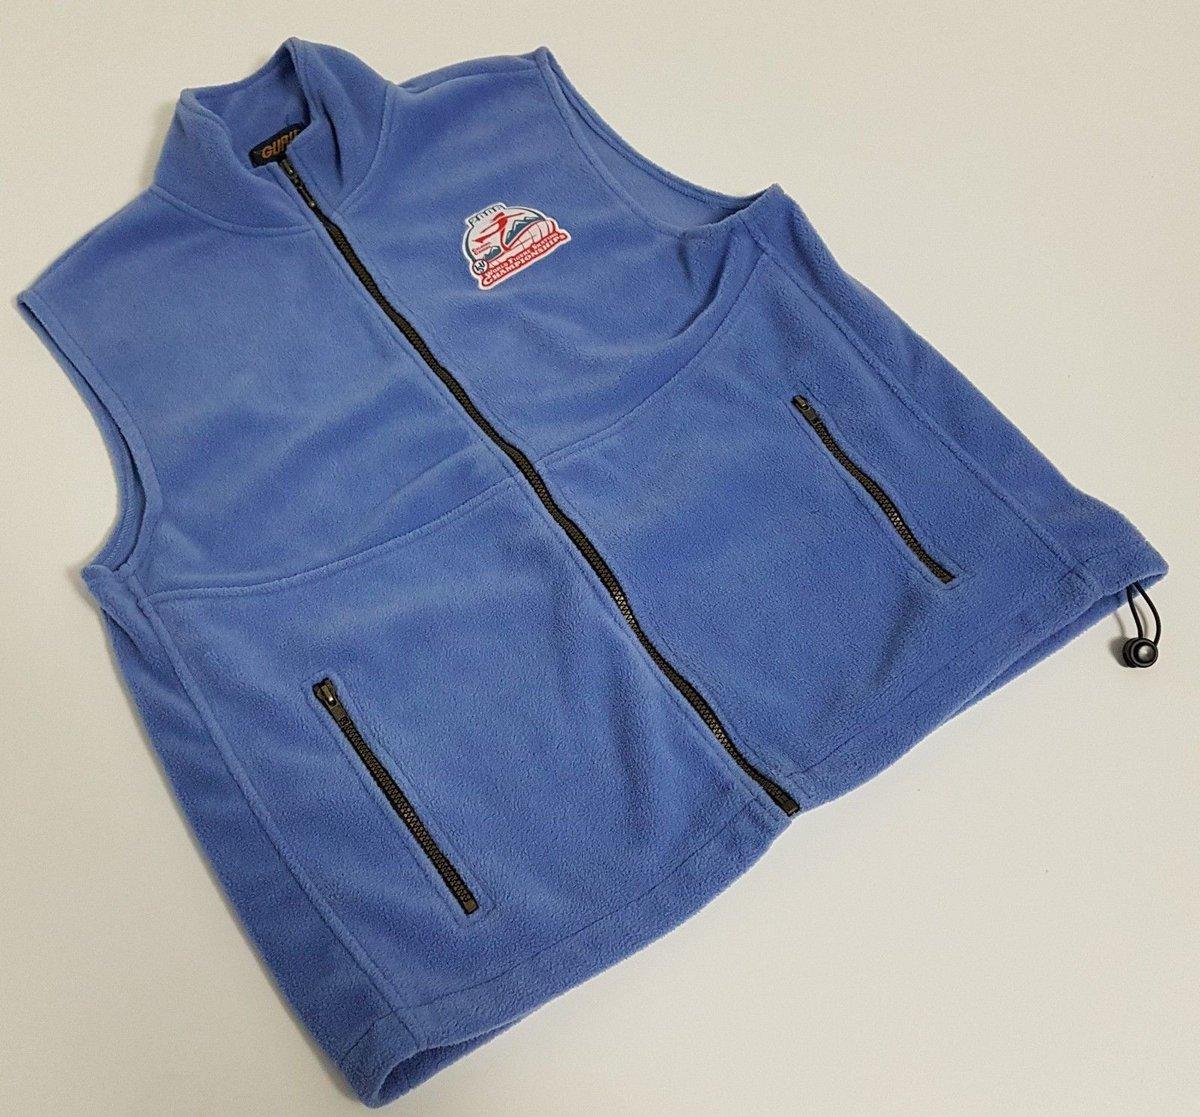 Treasures By Brenda On Twitter World Figure Skating Championships Fleece Vest From 2006 ISU Calgary Canada Size Large Tco KWzUyV25dl